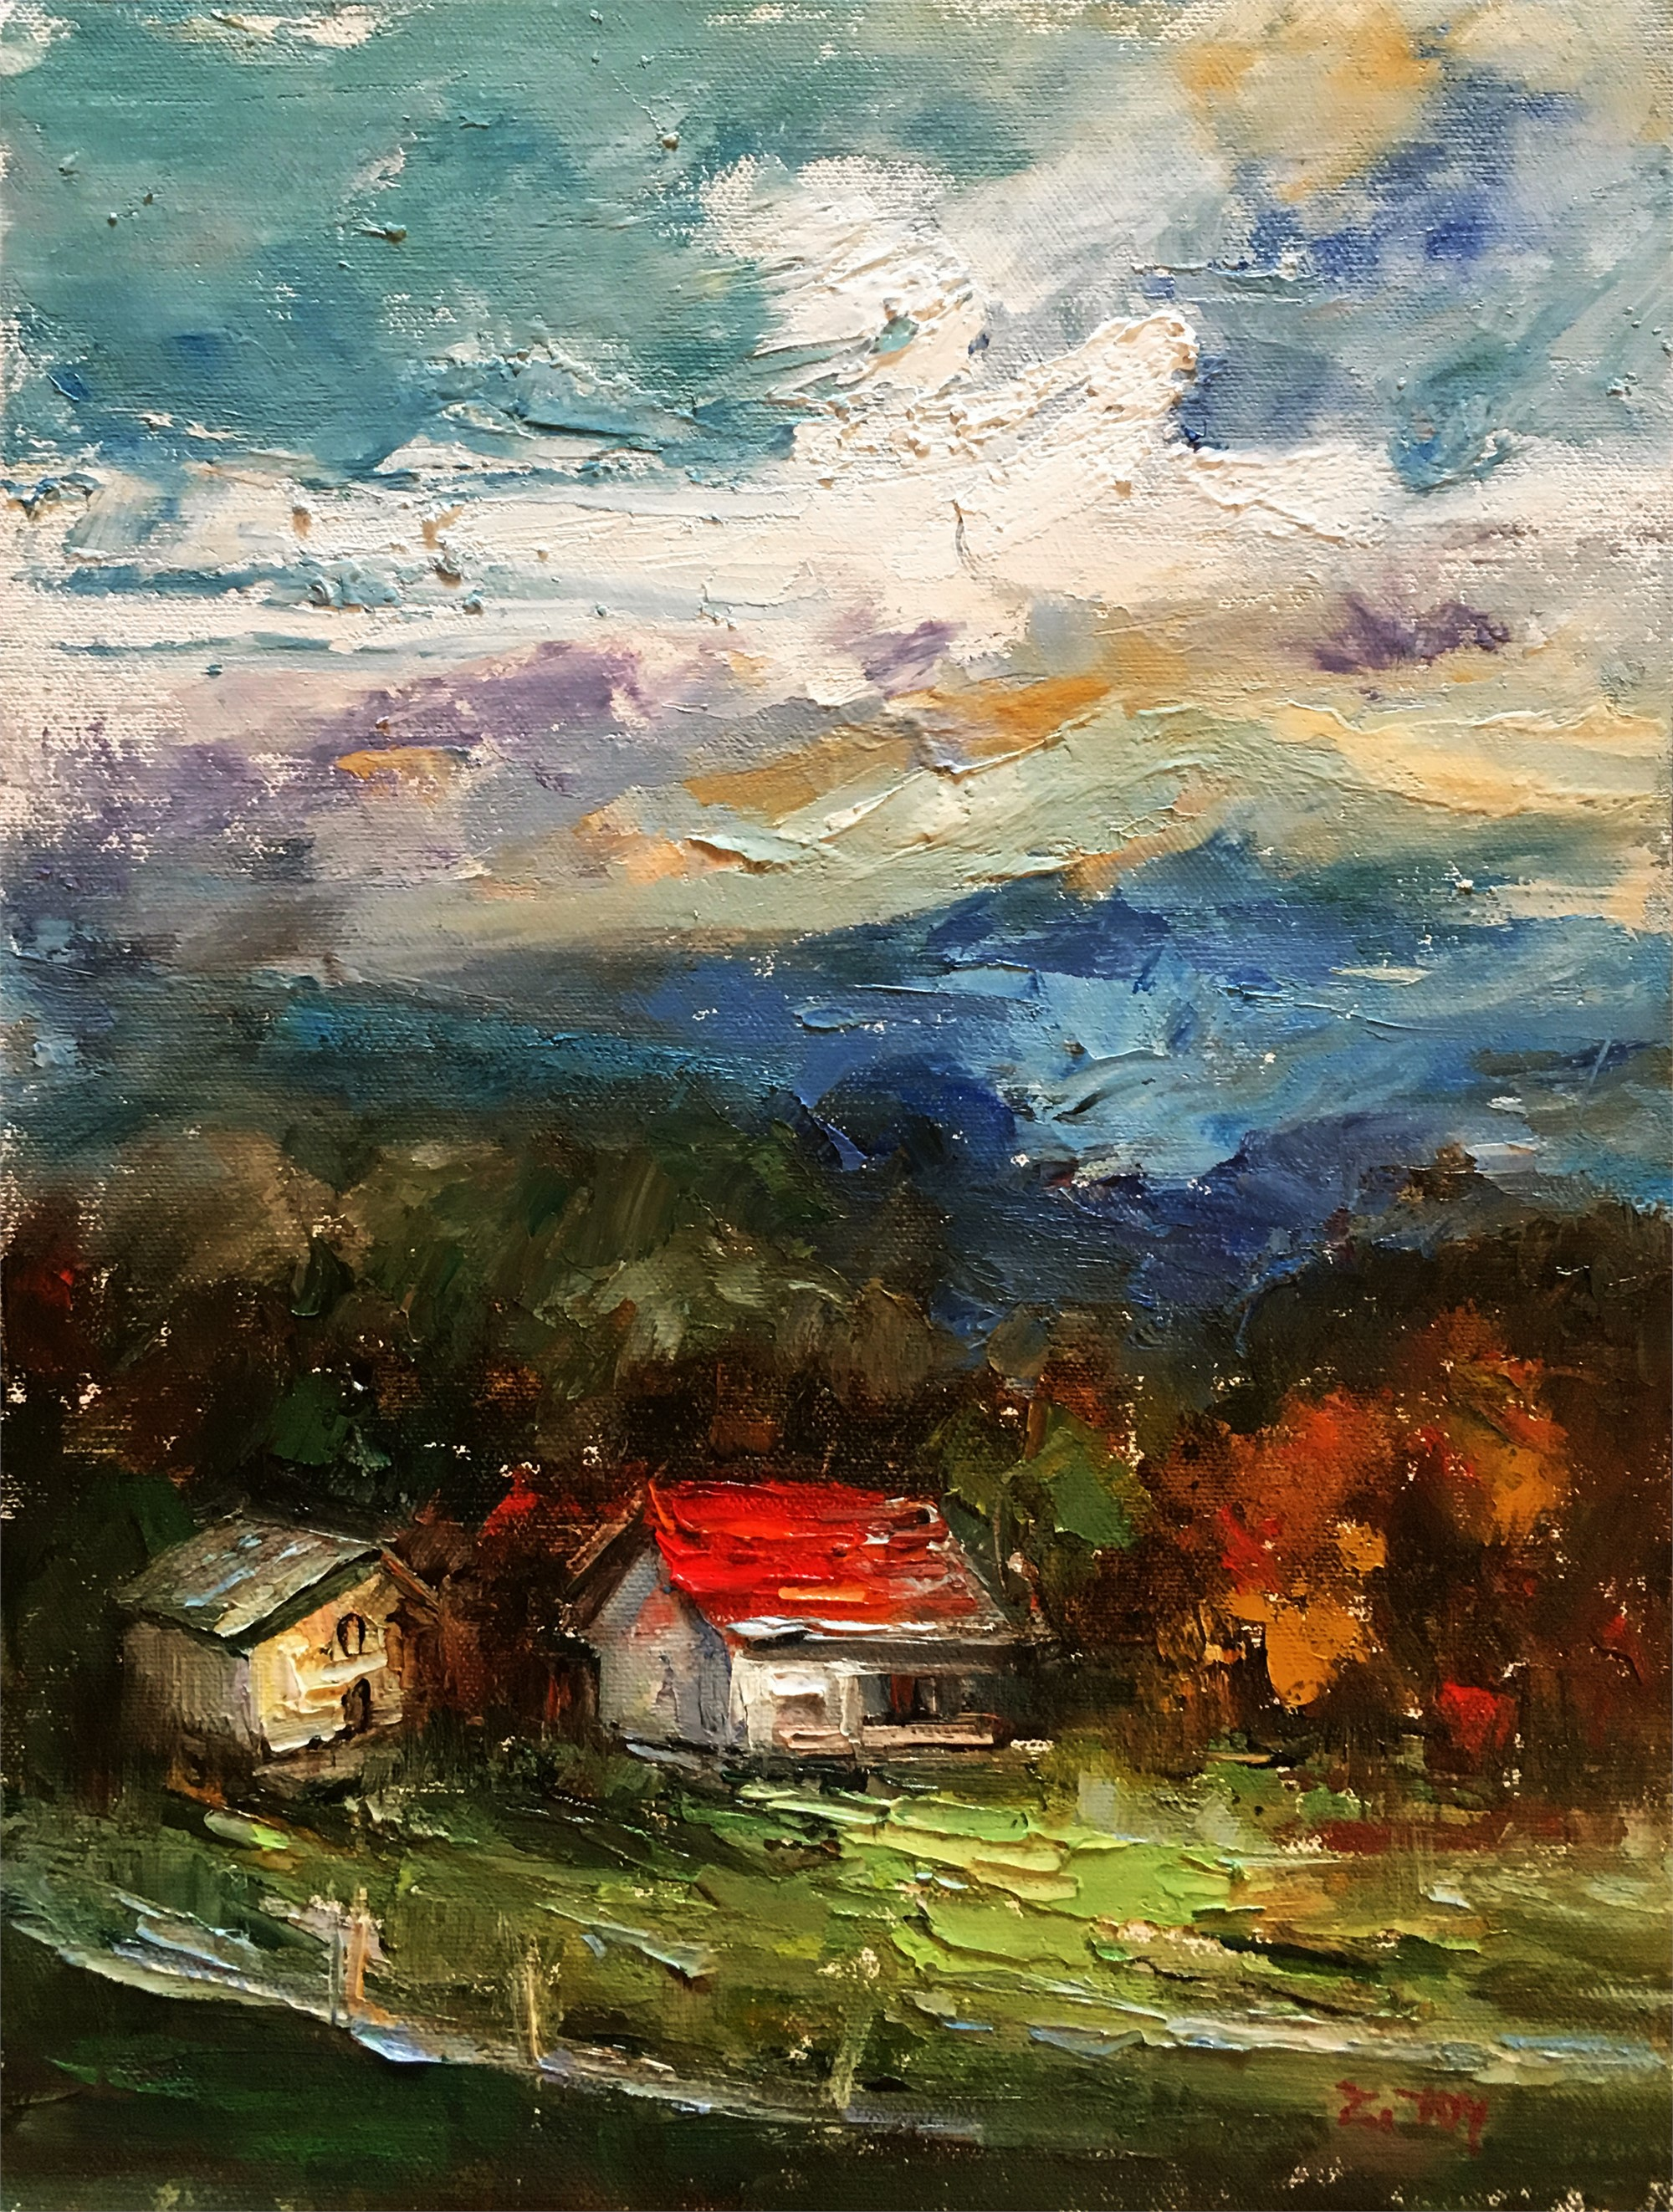 Afternoon Sky by JOY